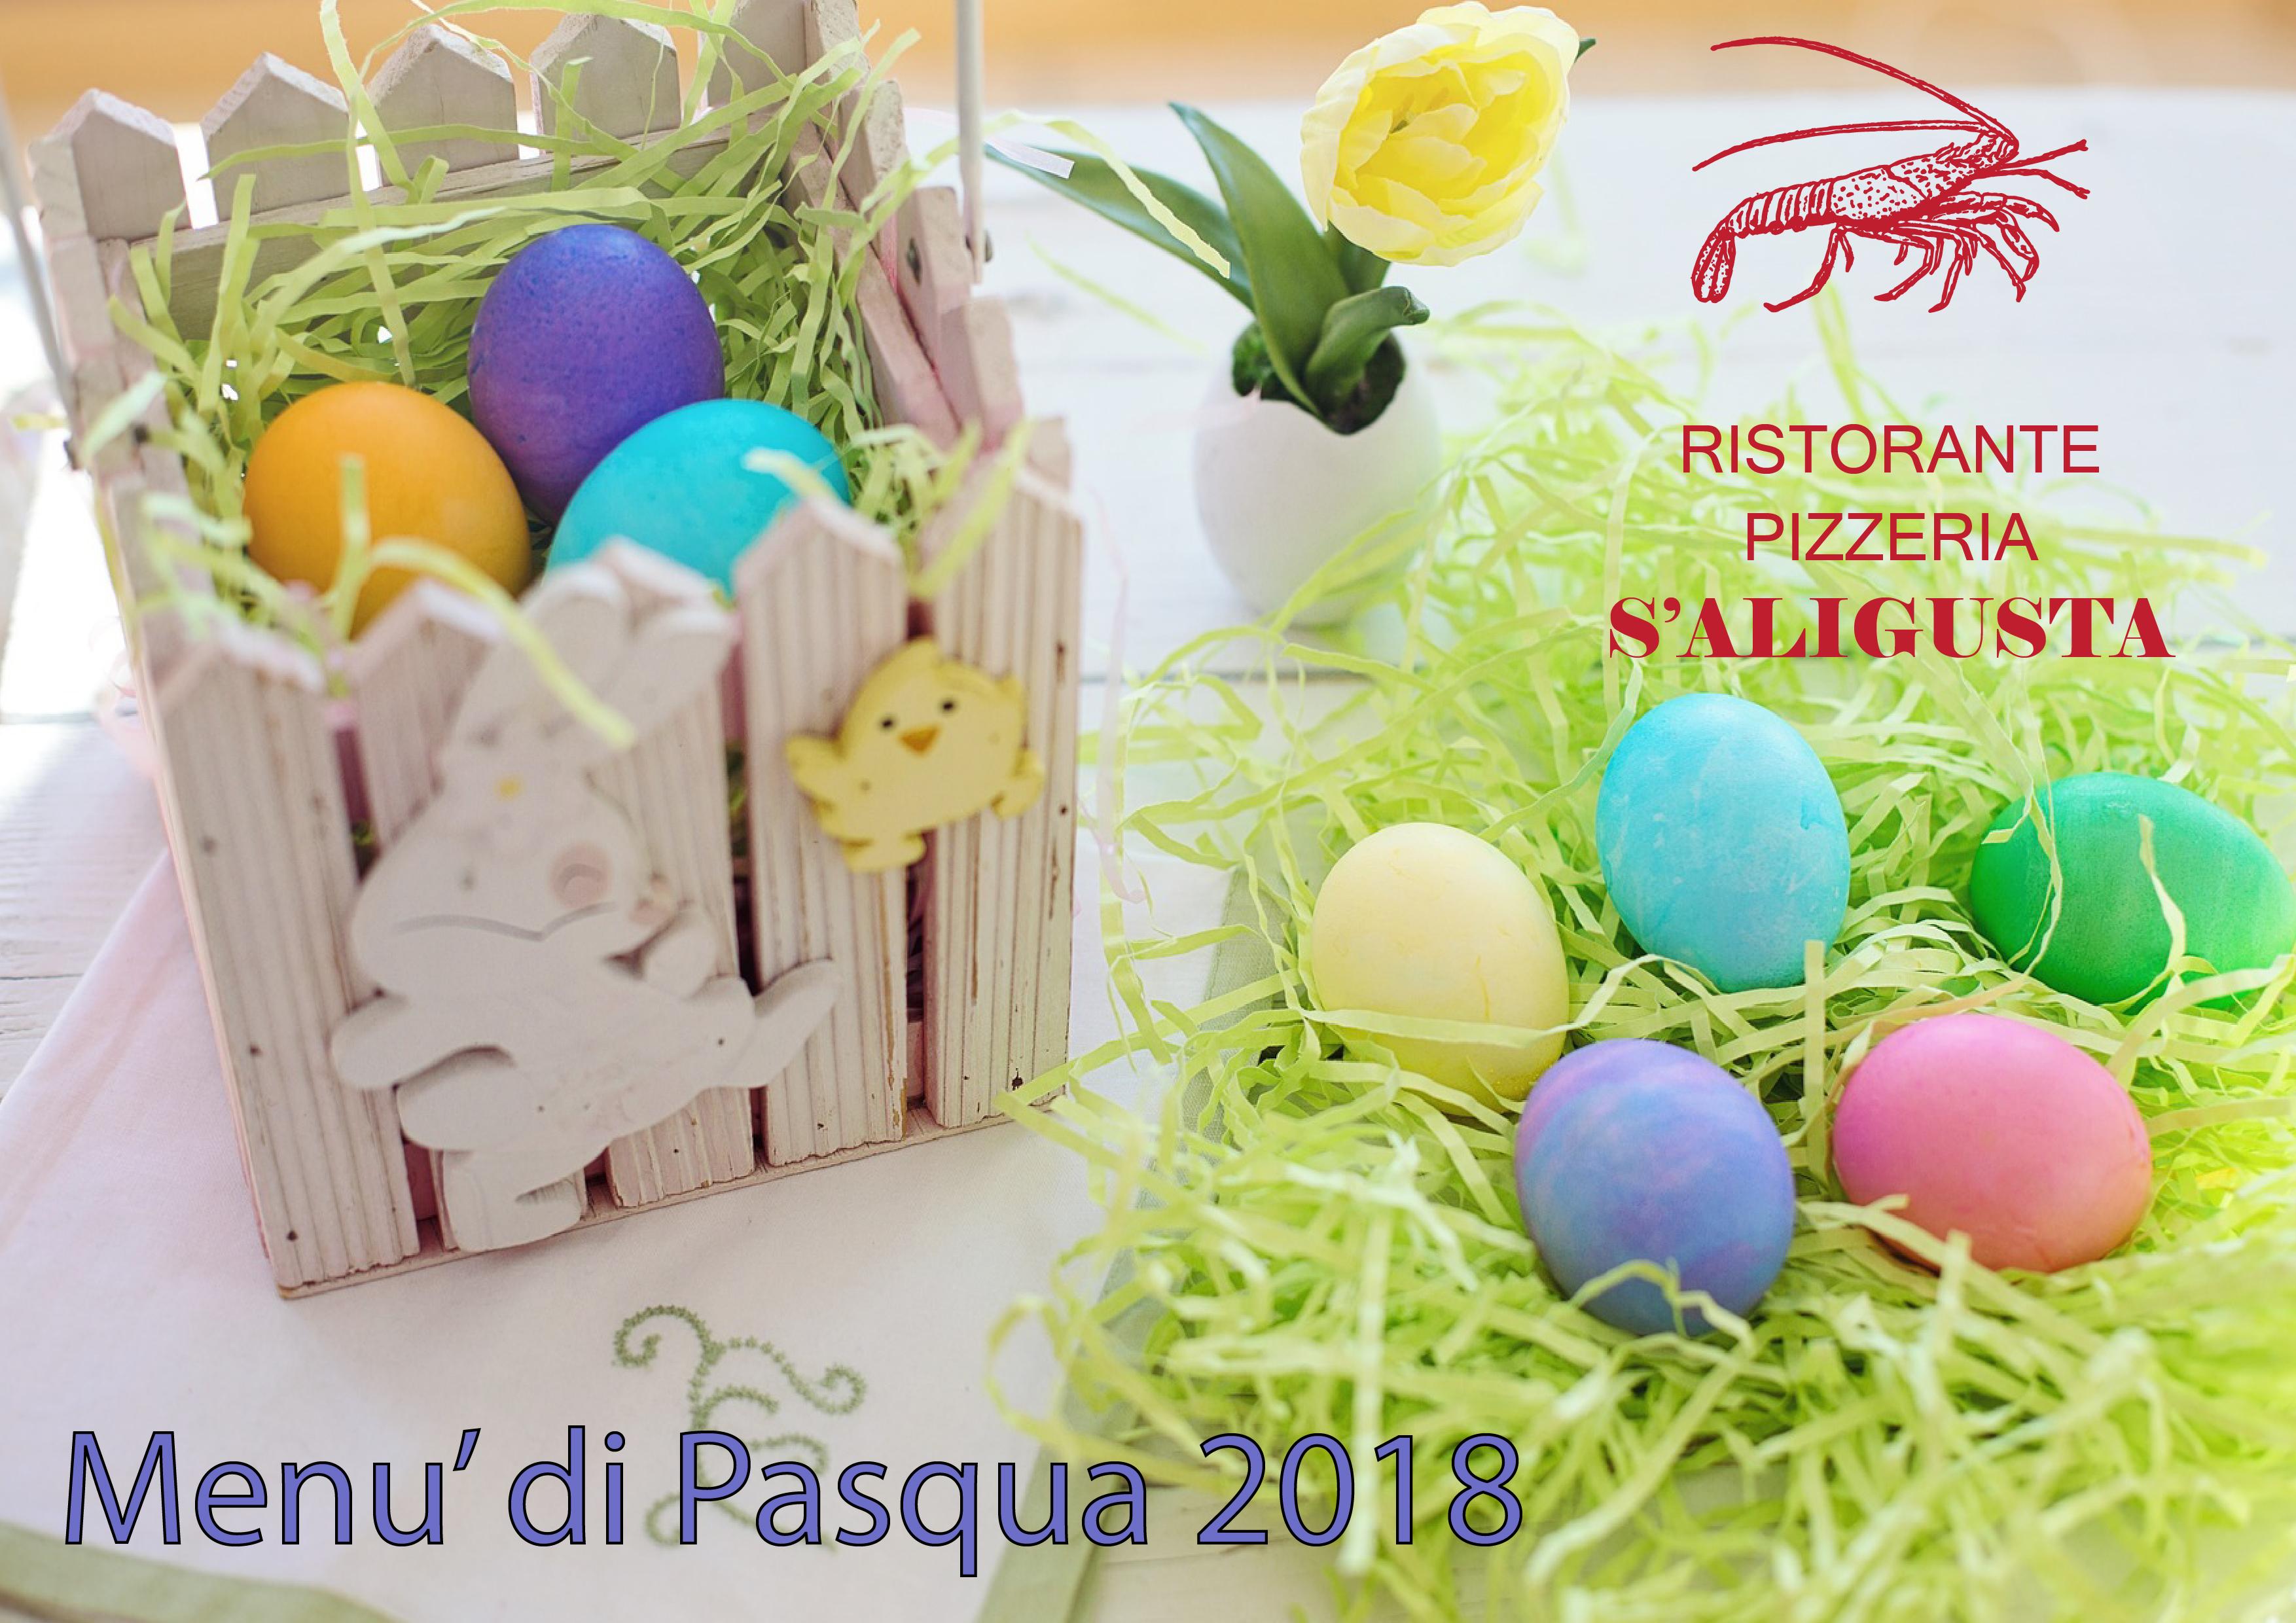 Buona Pasqua Saligusta